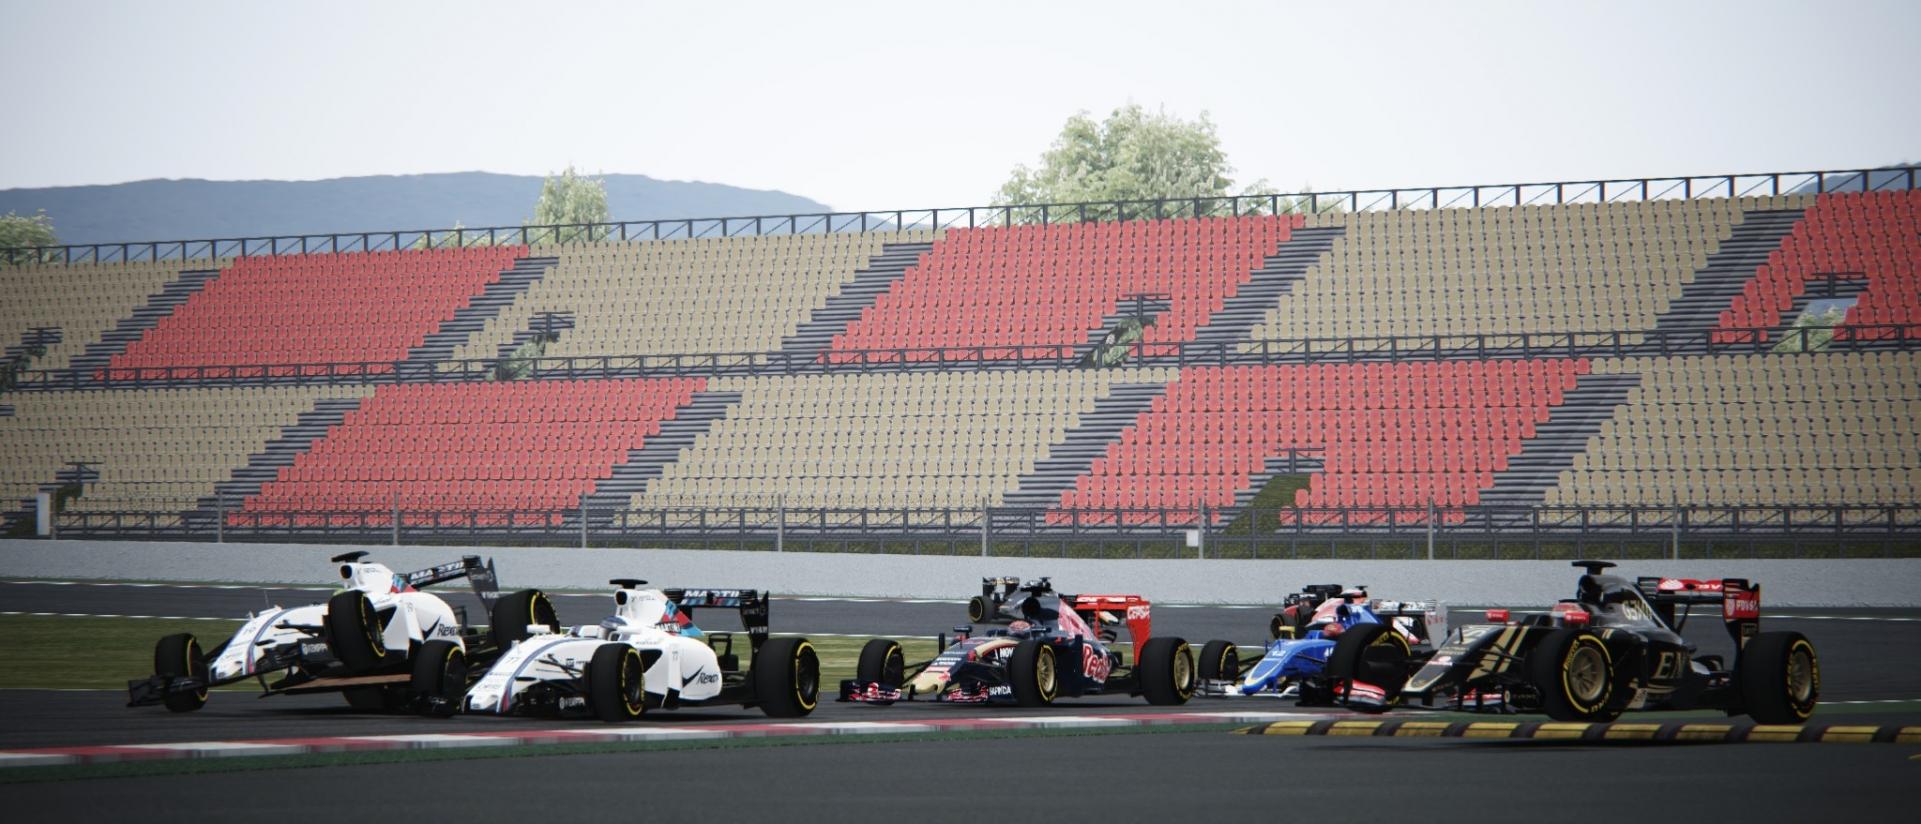 Assetto Corsa - ACFL F1 2015 Catalunya 03